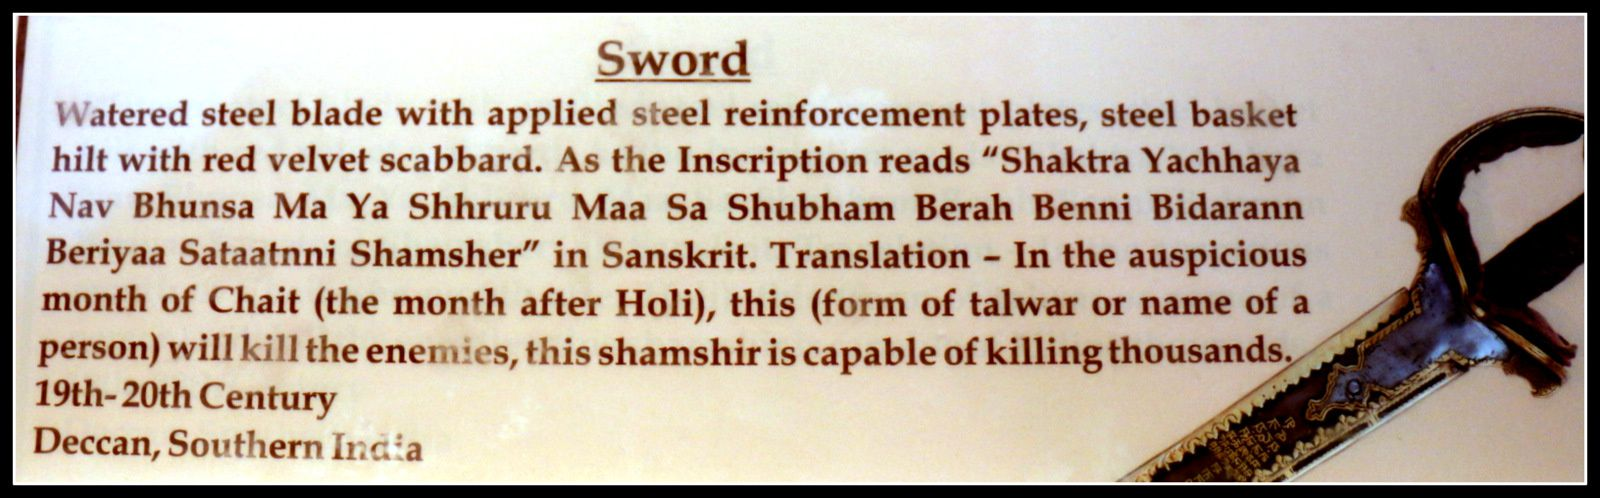 Musée de Mehrangarh (Jodhpur, Inde), canon et épées